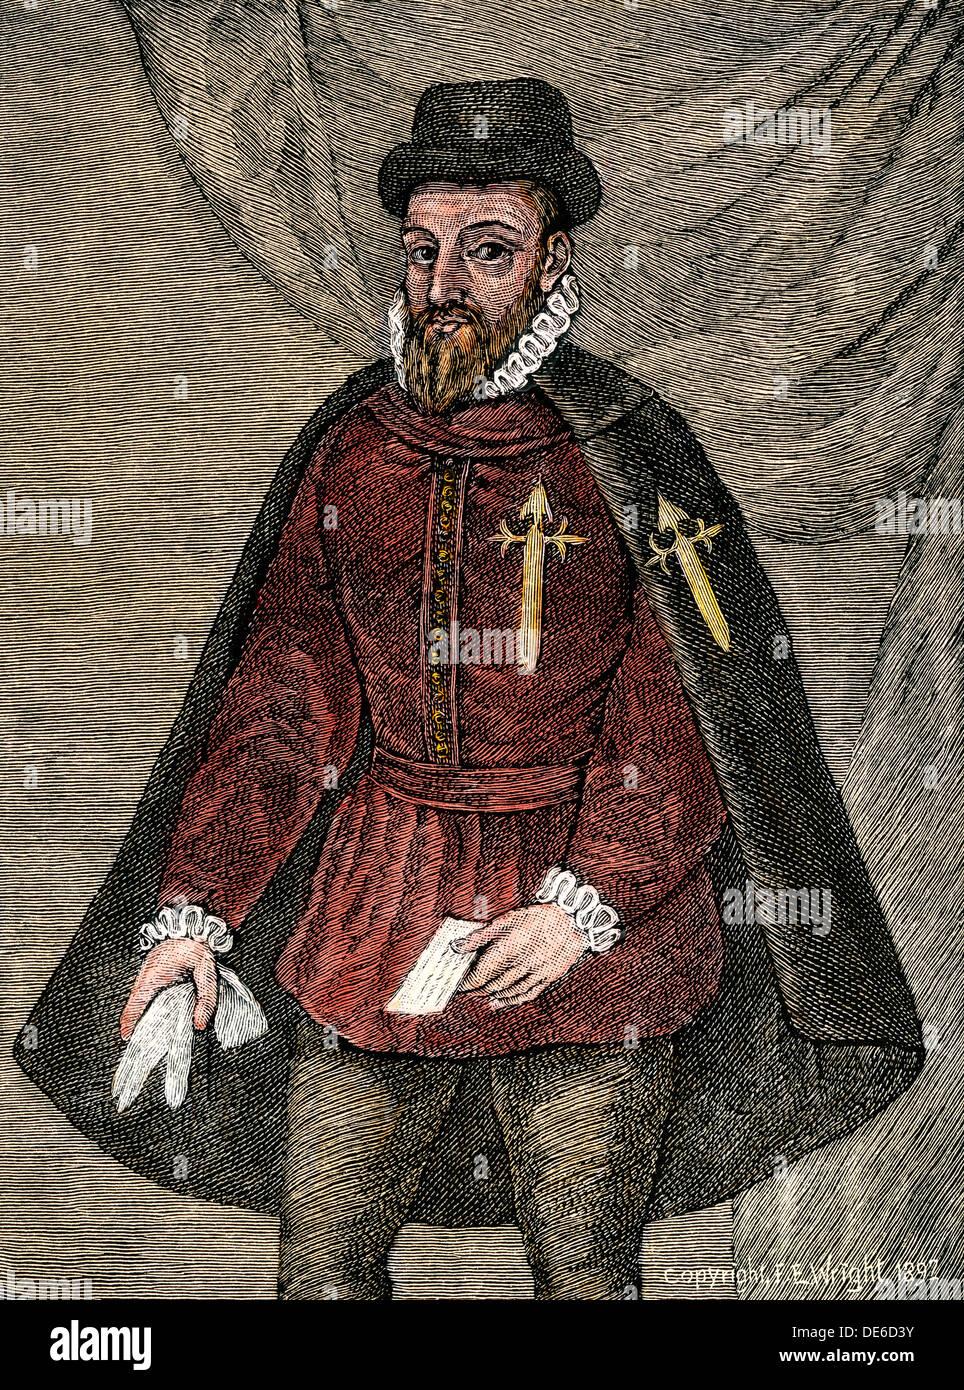 Francisco Pizarro, conqueror of Peru, standing. Hand-colored woodcut - Stock Image